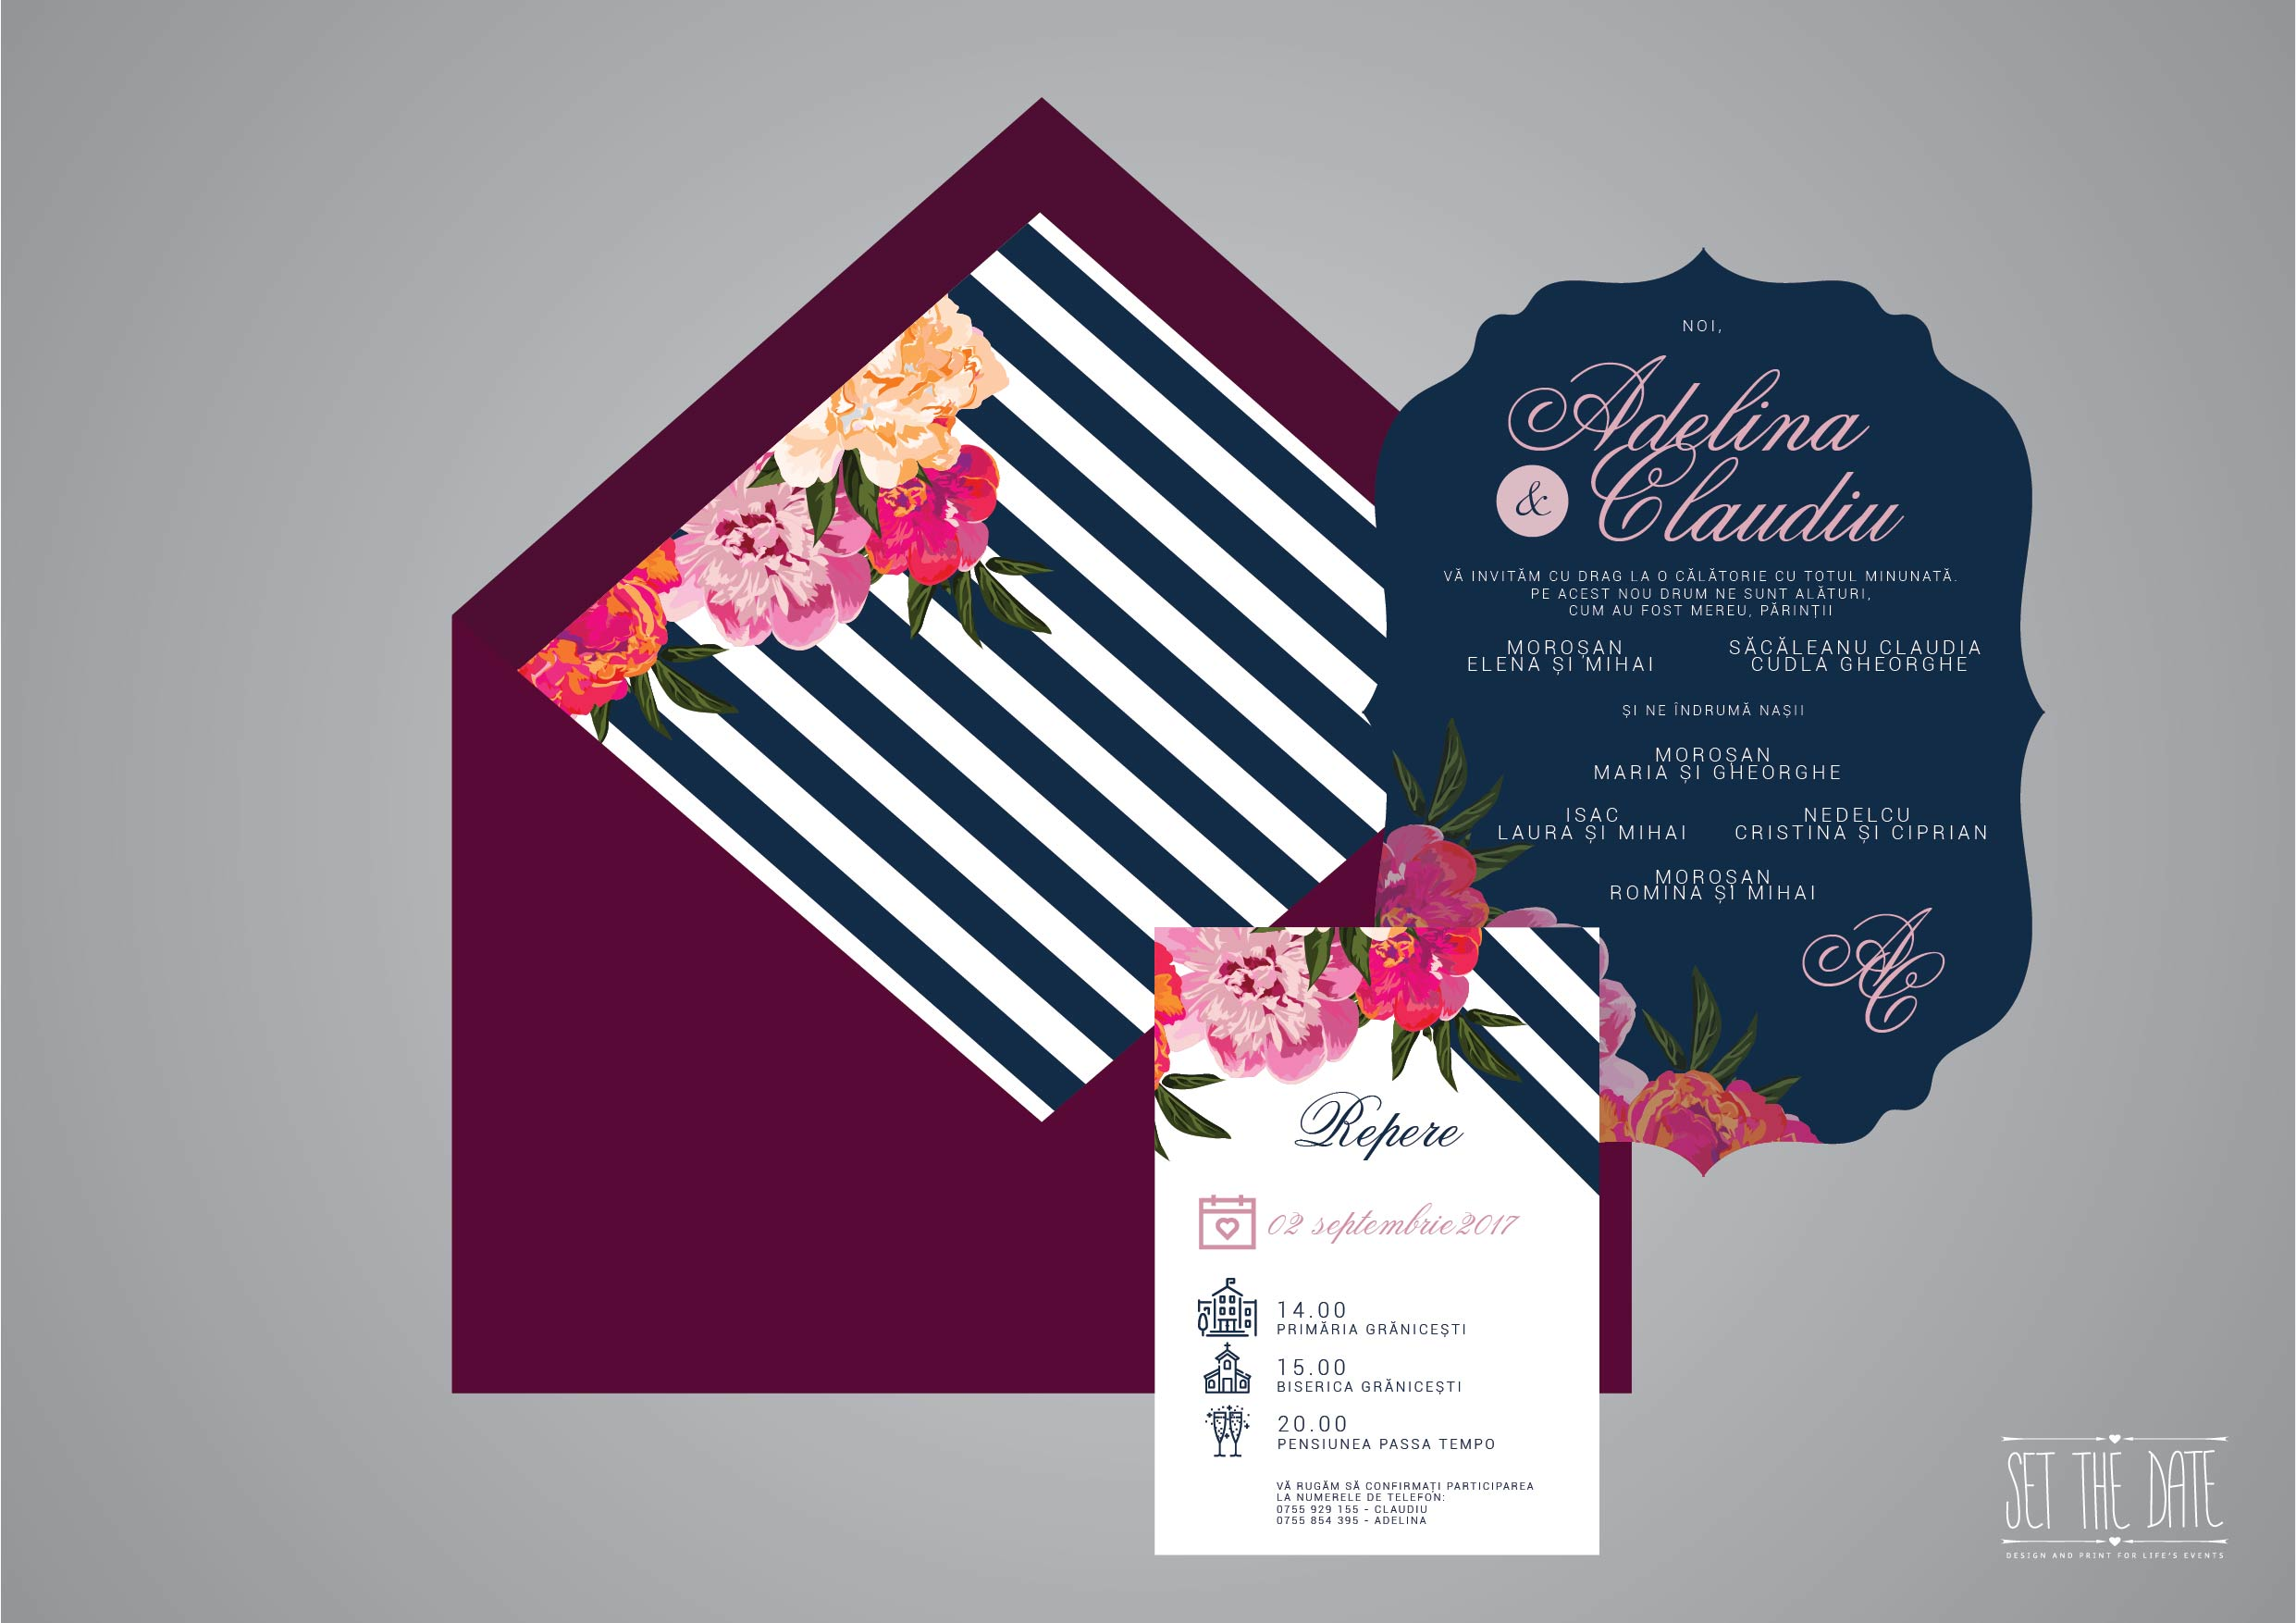 Invitatie_Adelina si Claudiu-02.jpg